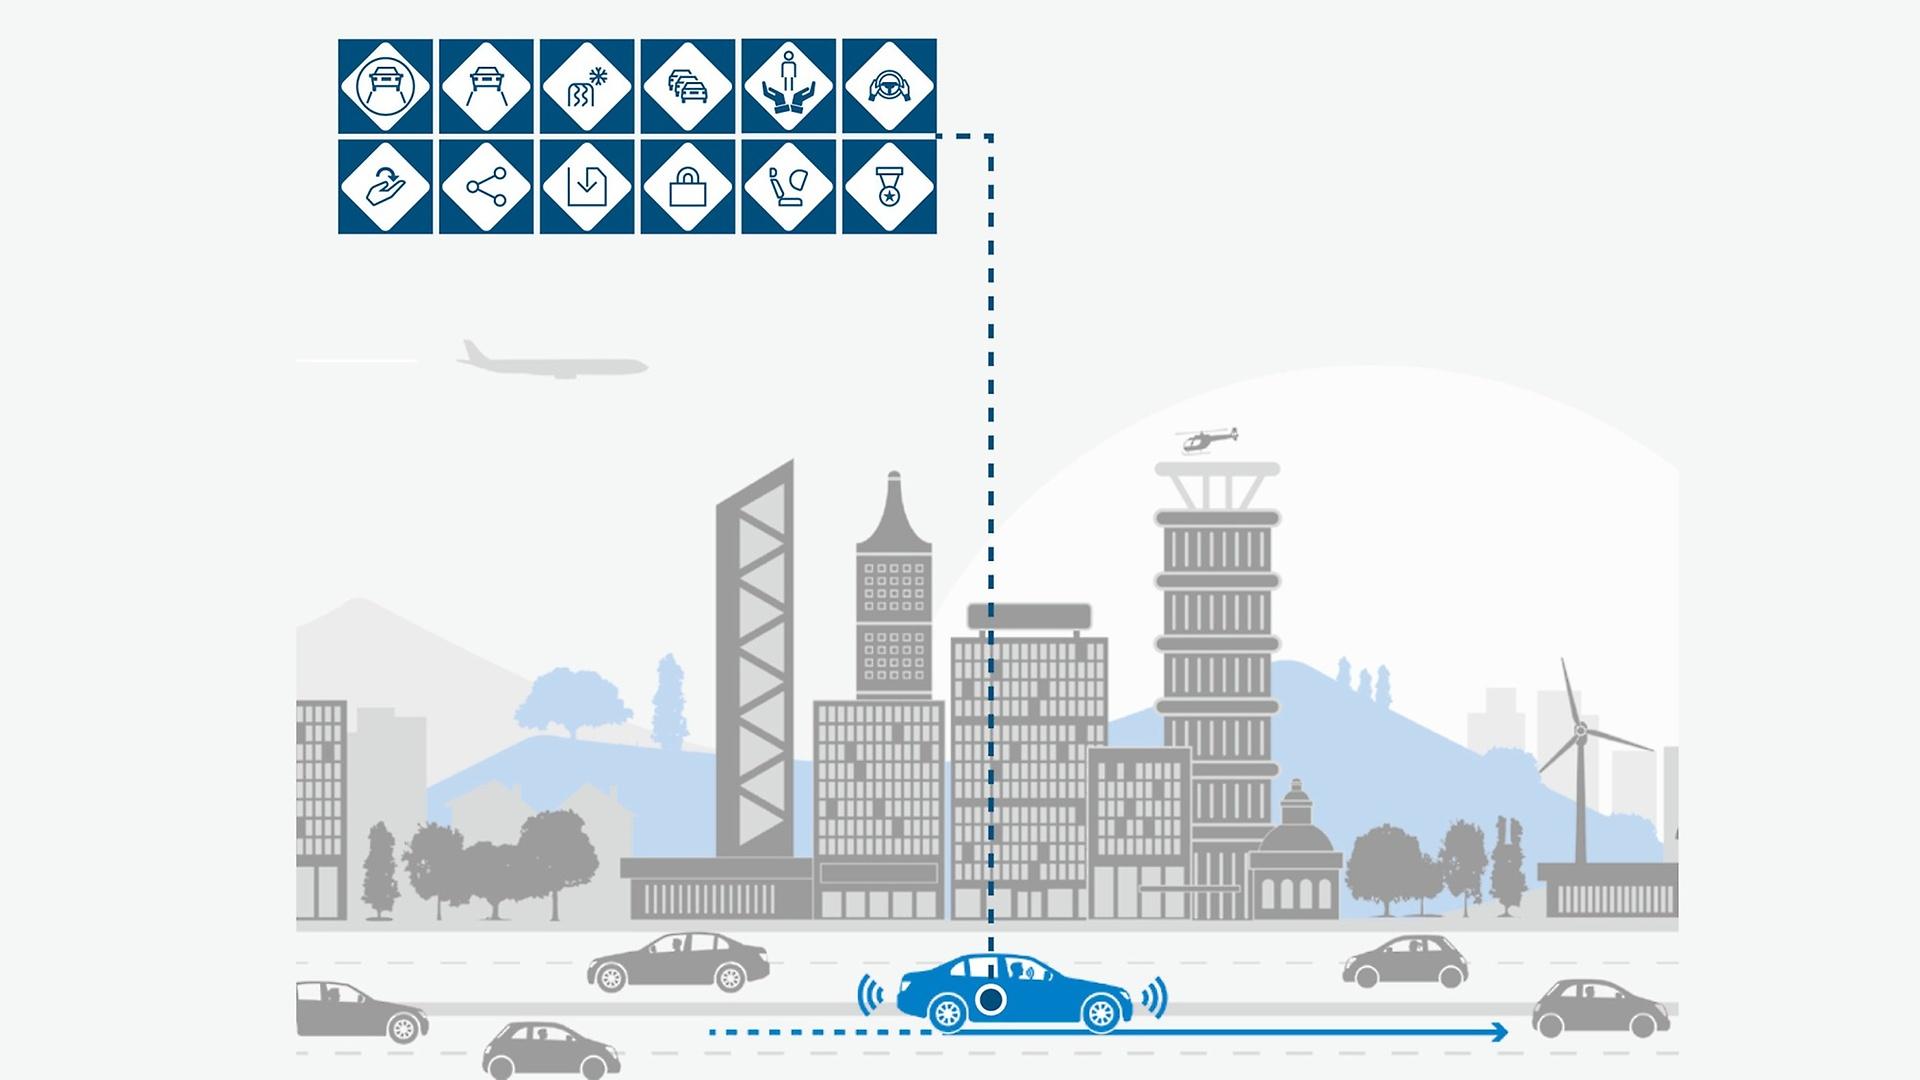 AV, Auto OEMs Define 12 Guiding Safety Principles for Safe Autonomous Driving